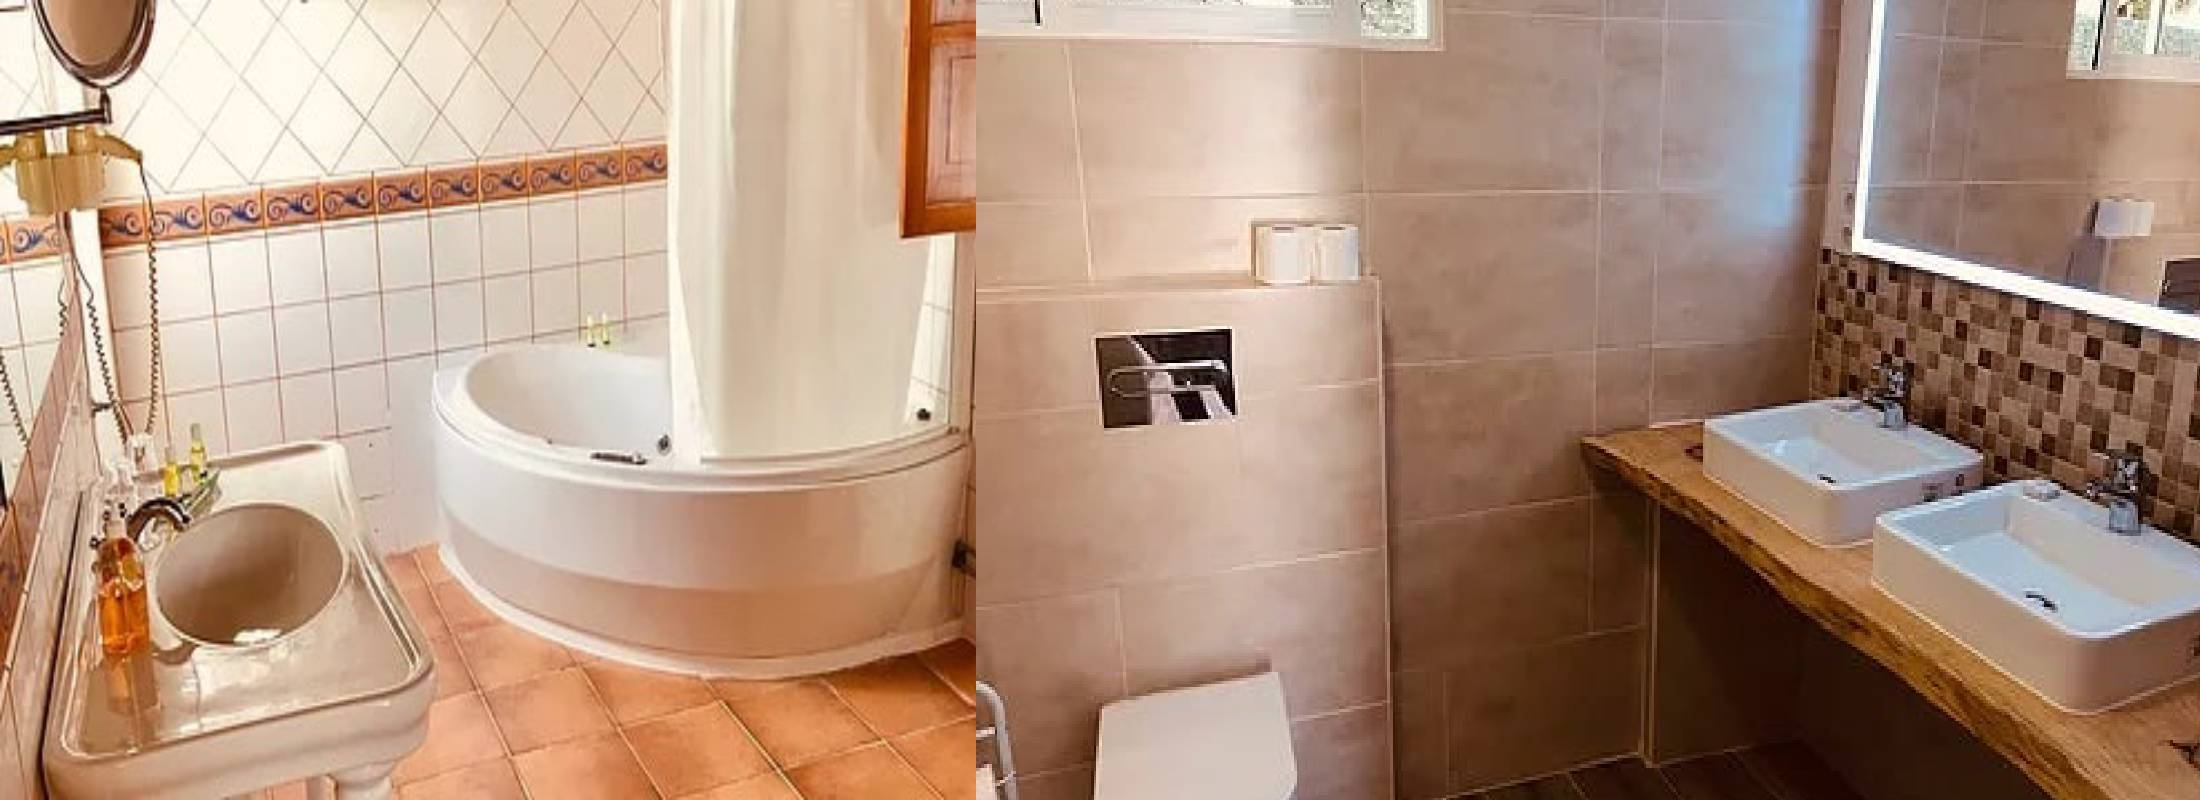 baño interior retiro ibiza